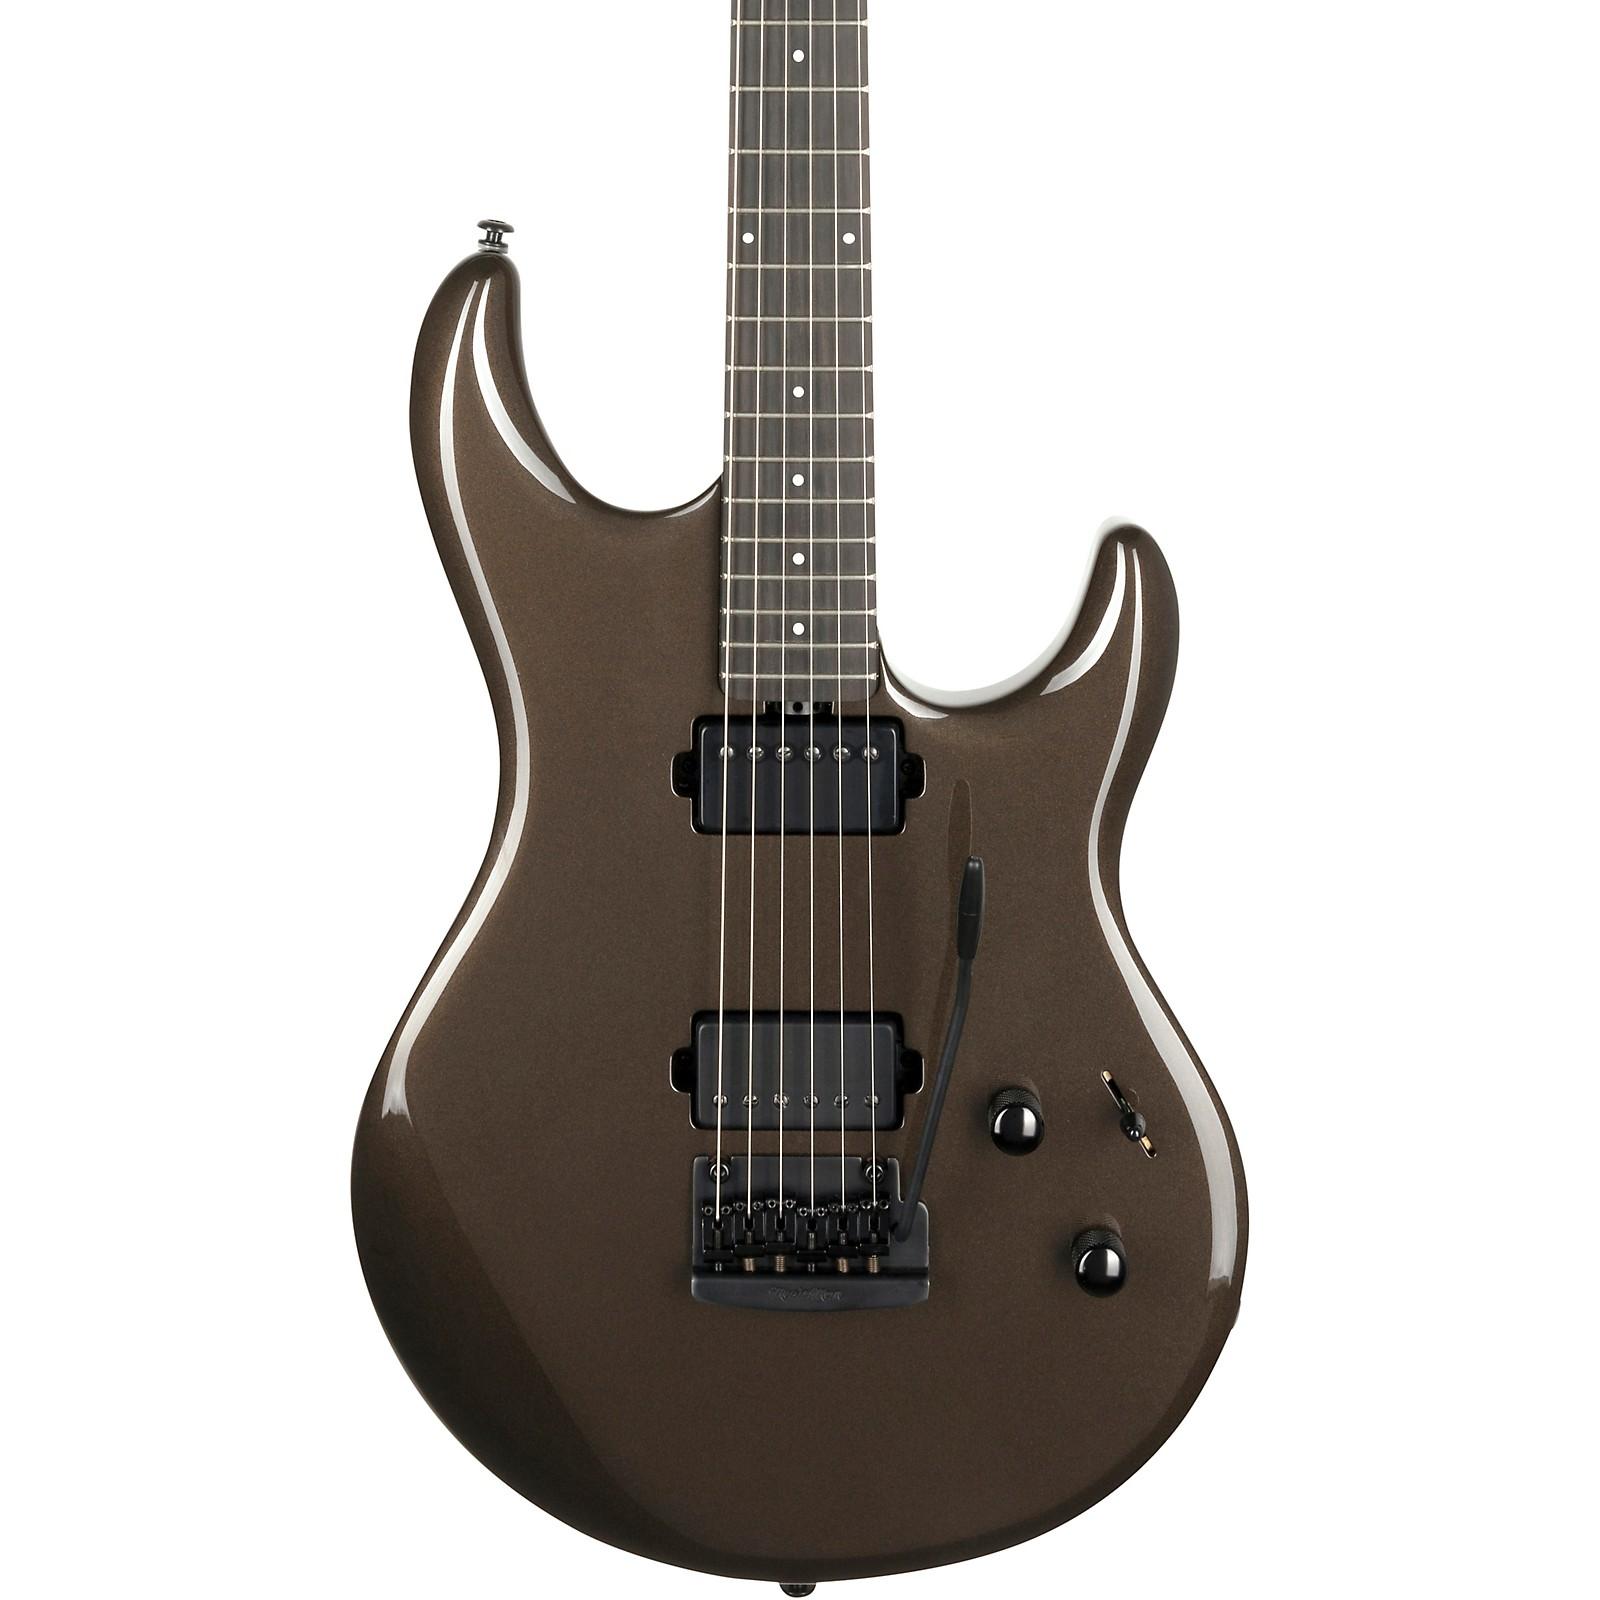 Ernie Ball Music Man Luke 3 HH Ebony Fingerboard Electric Guitar